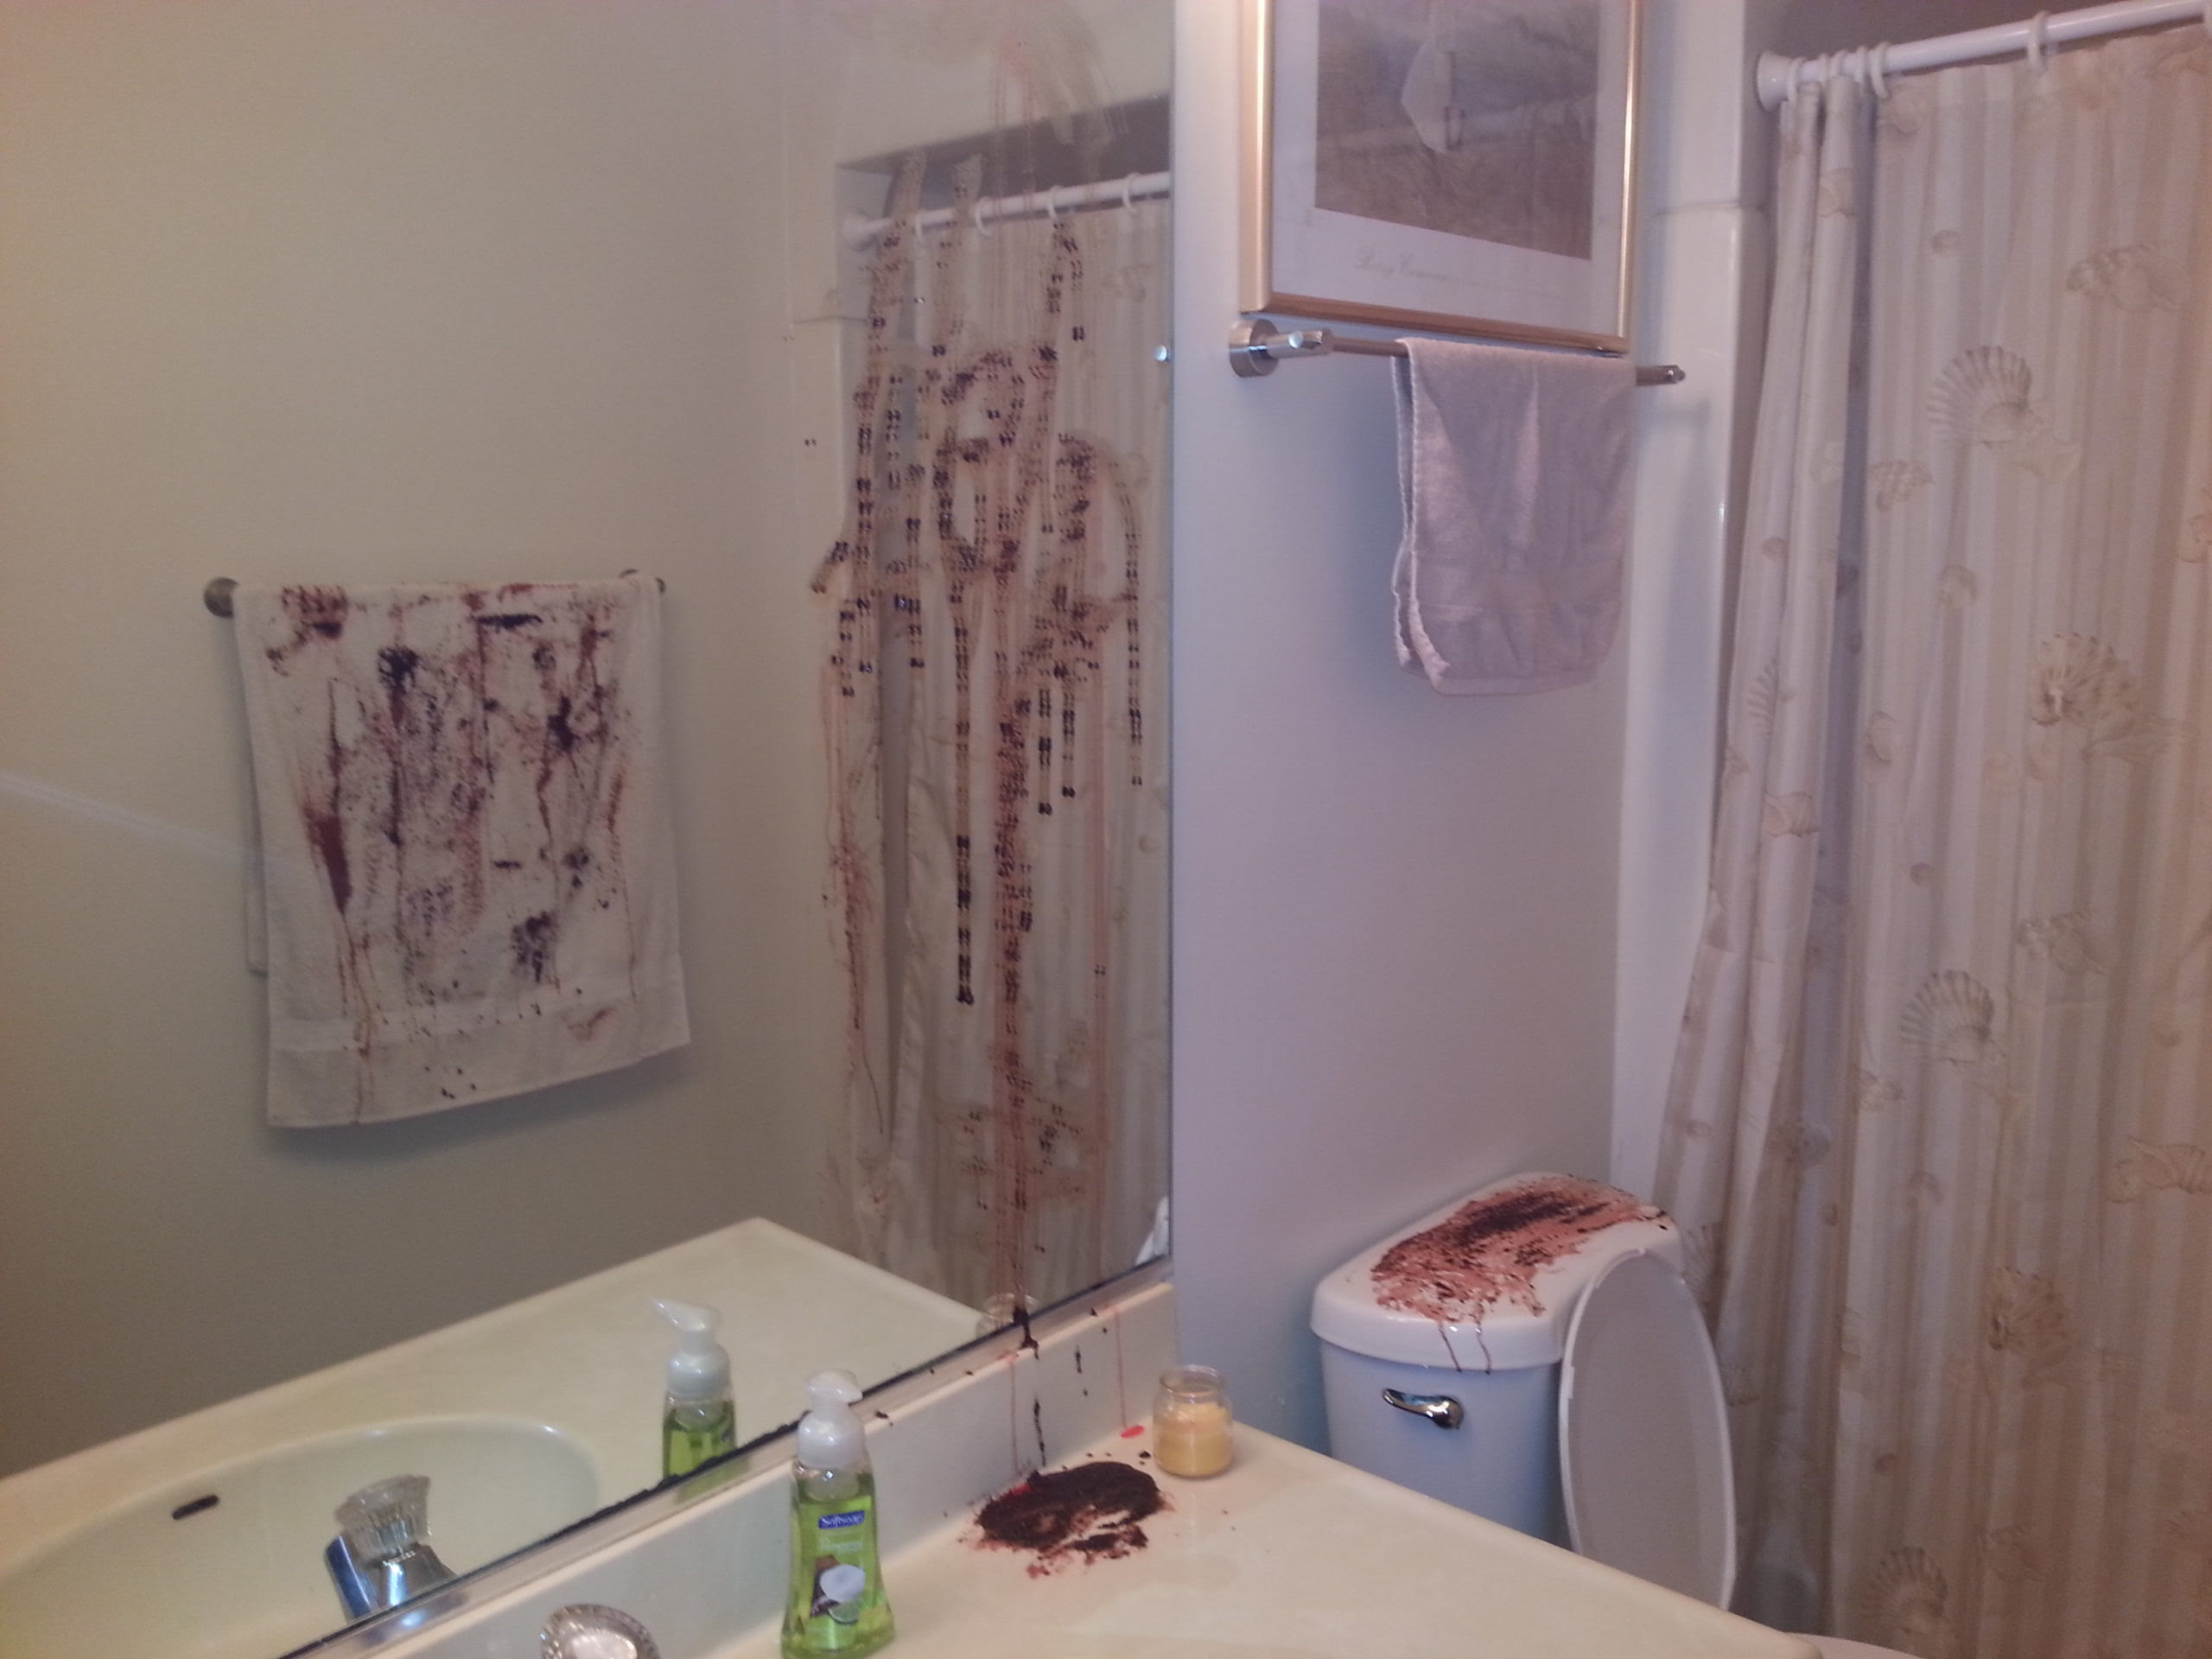 DIY Halloween Bathroom Decor. Or How Chrissy is SERIOUSLY ...